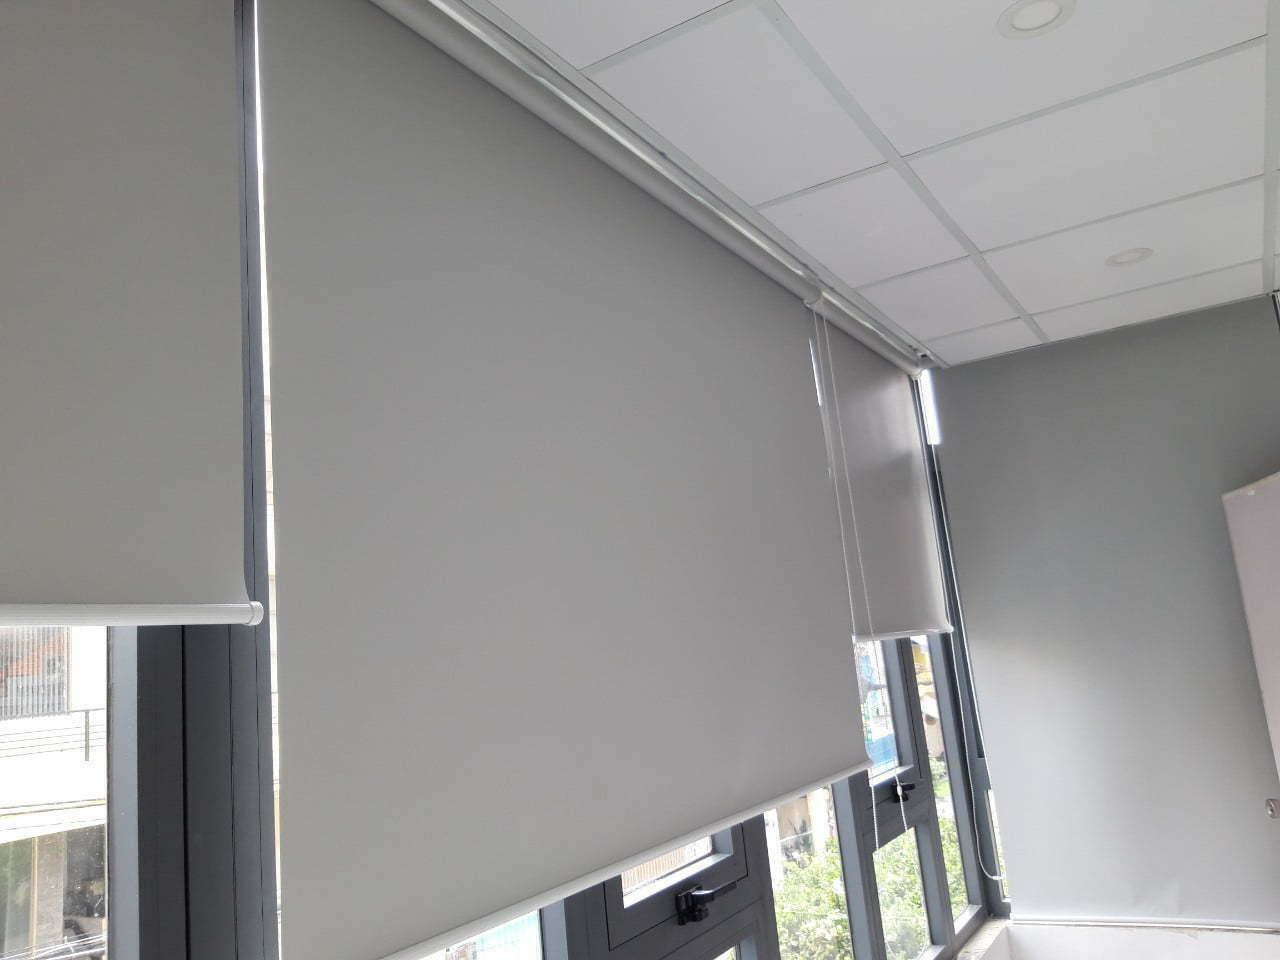 Rèm cuốn cửa sổ màu xám cao cấp | Vinarem